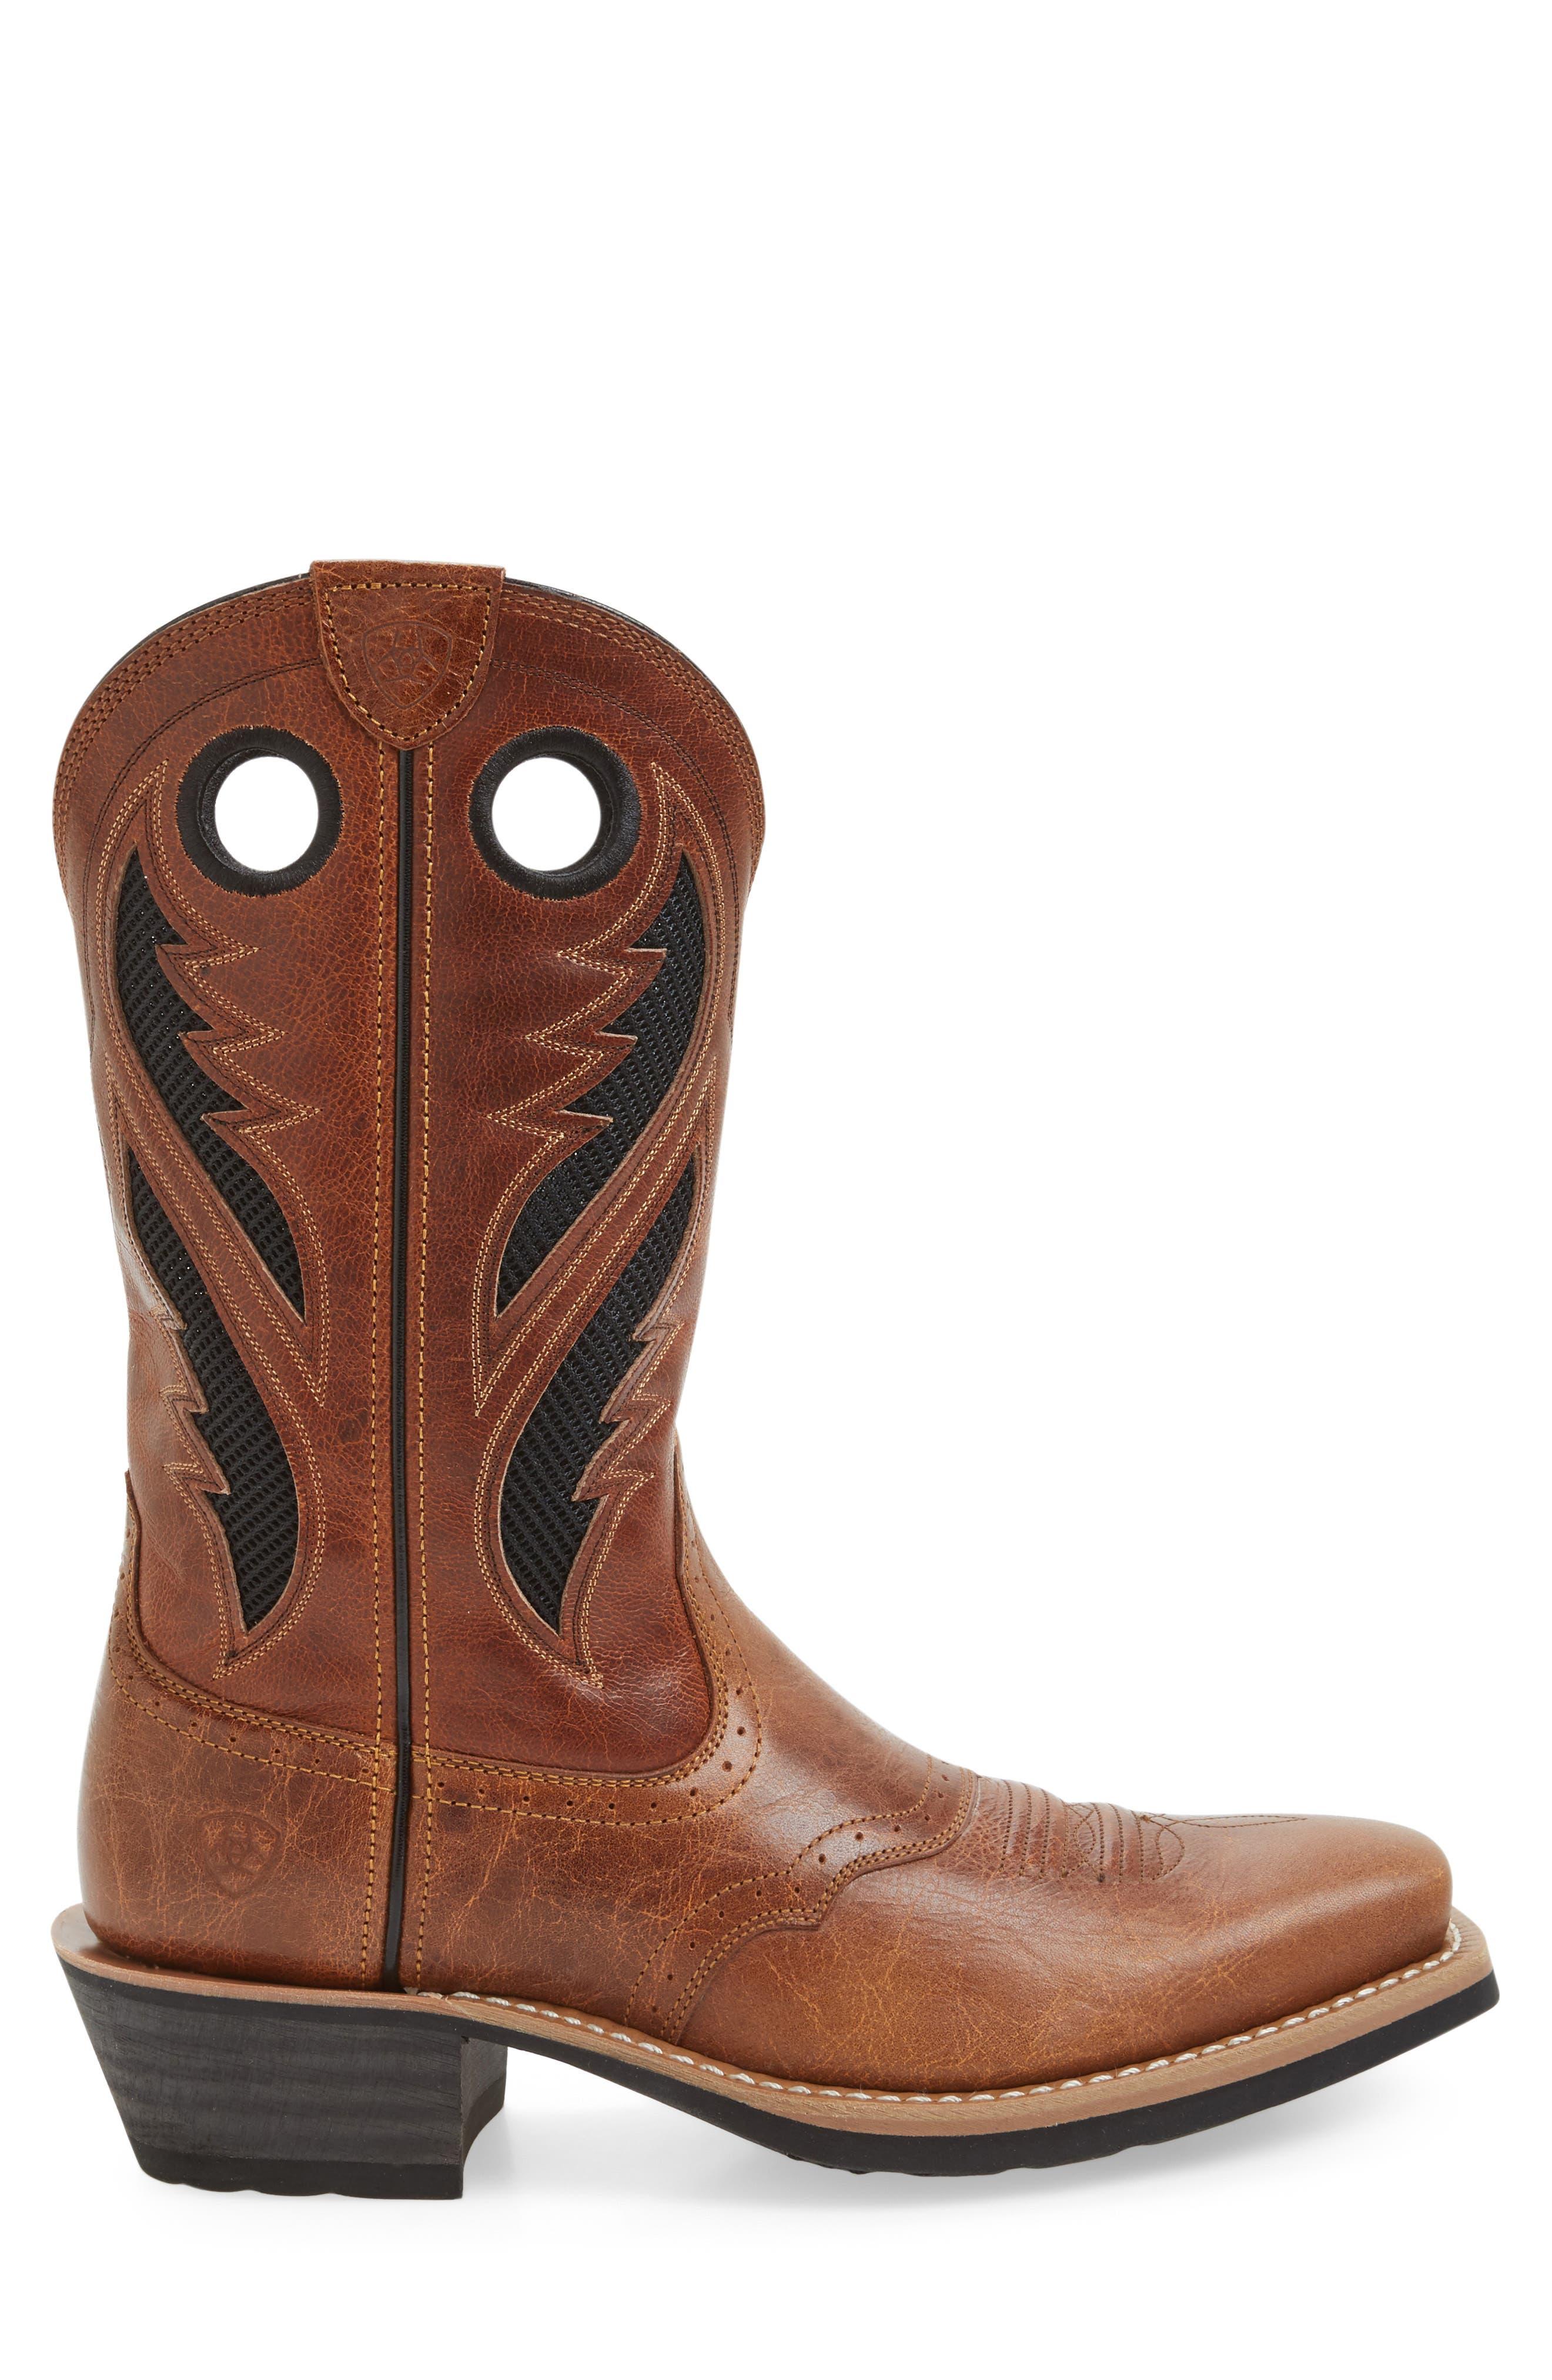 Heritage Roughstock VentTEK Cowboy Boot,                             Alternate thumbnail 3, color,                             200